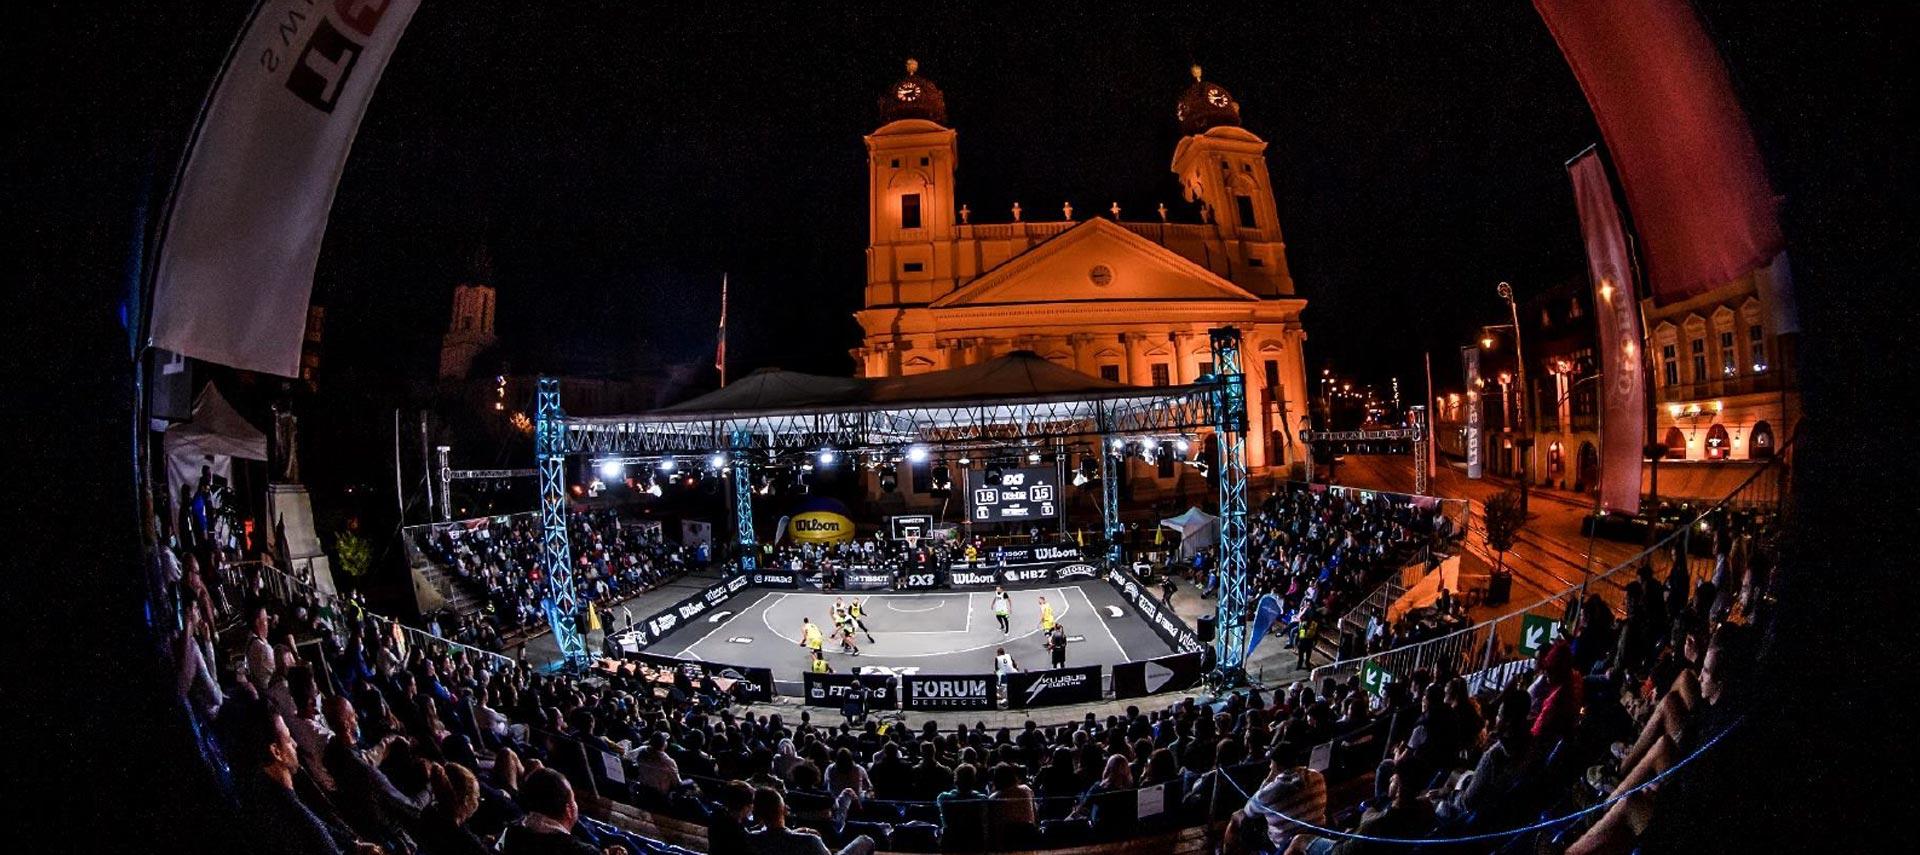 The FIBA 3x3 court lit up at night